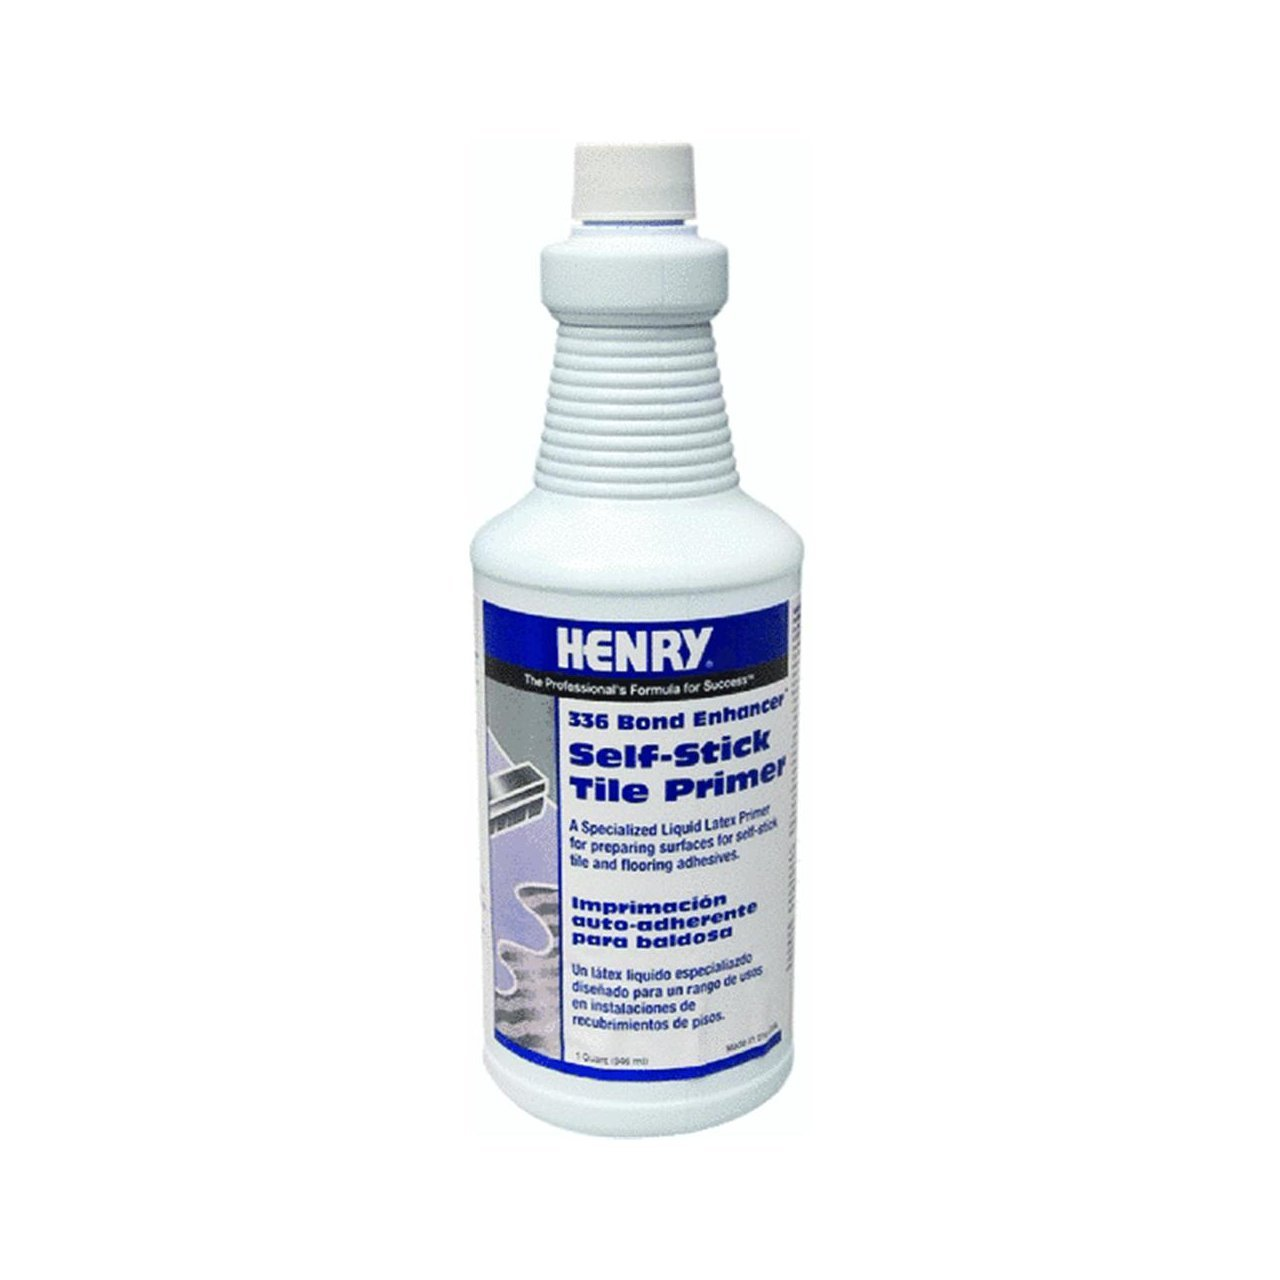 Henry Ww Co 12237 H336 Bond Enhancer Self Stick Tile Primer